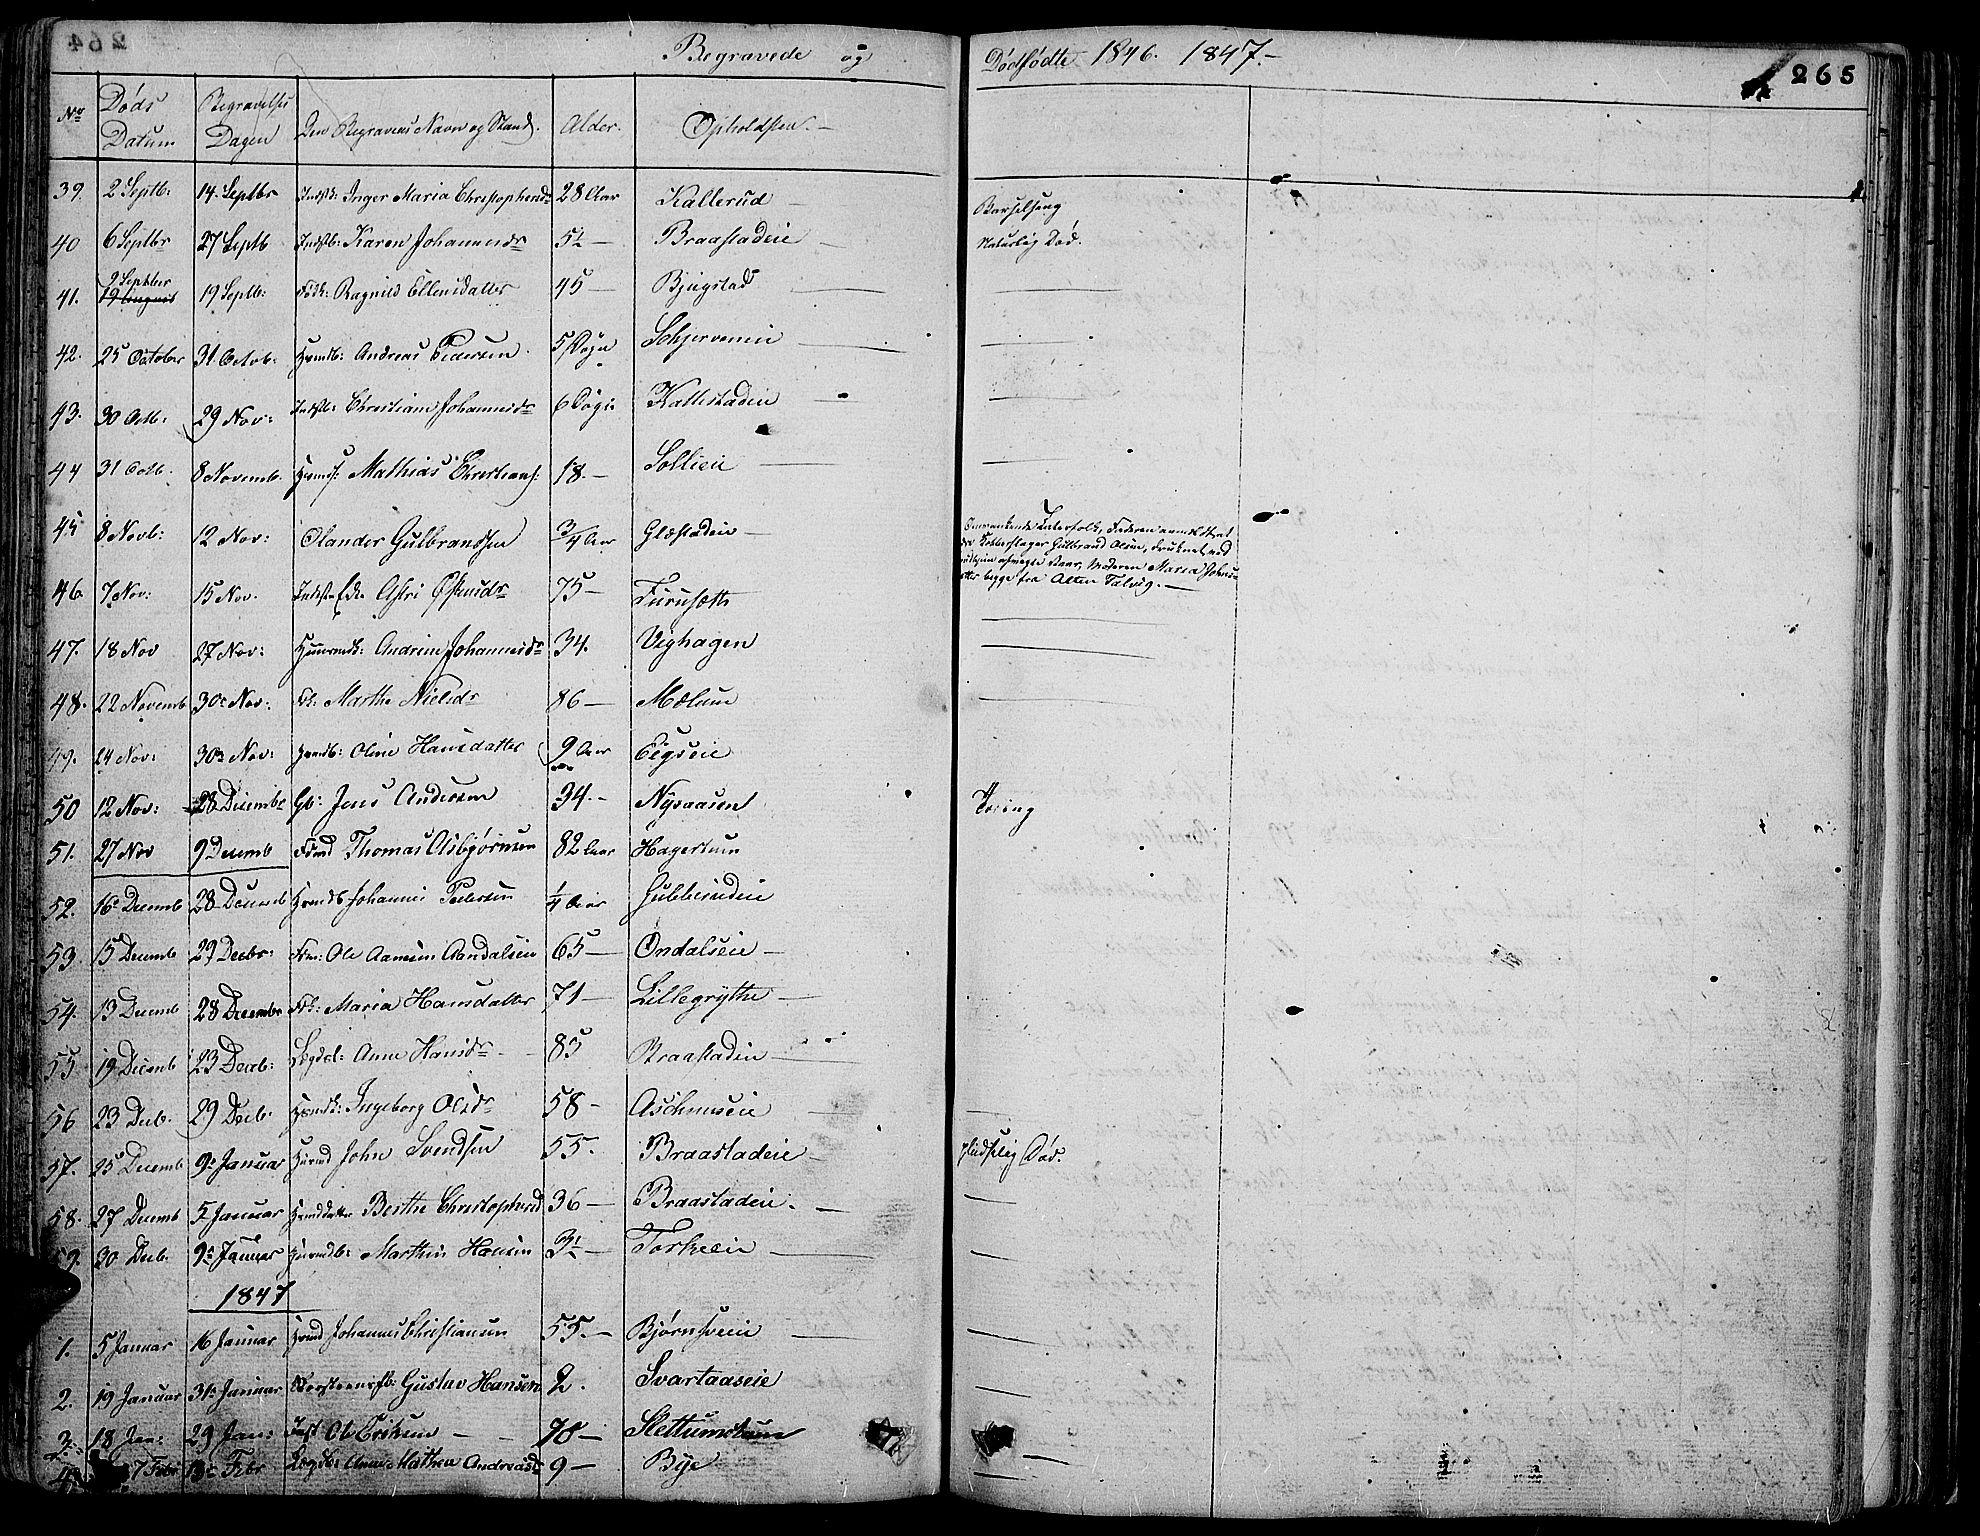 SAH, Vardal prestekontor, H/Ha/Hab/L0004: Klokkerbok nr. 4, 1831-1853, s. 265